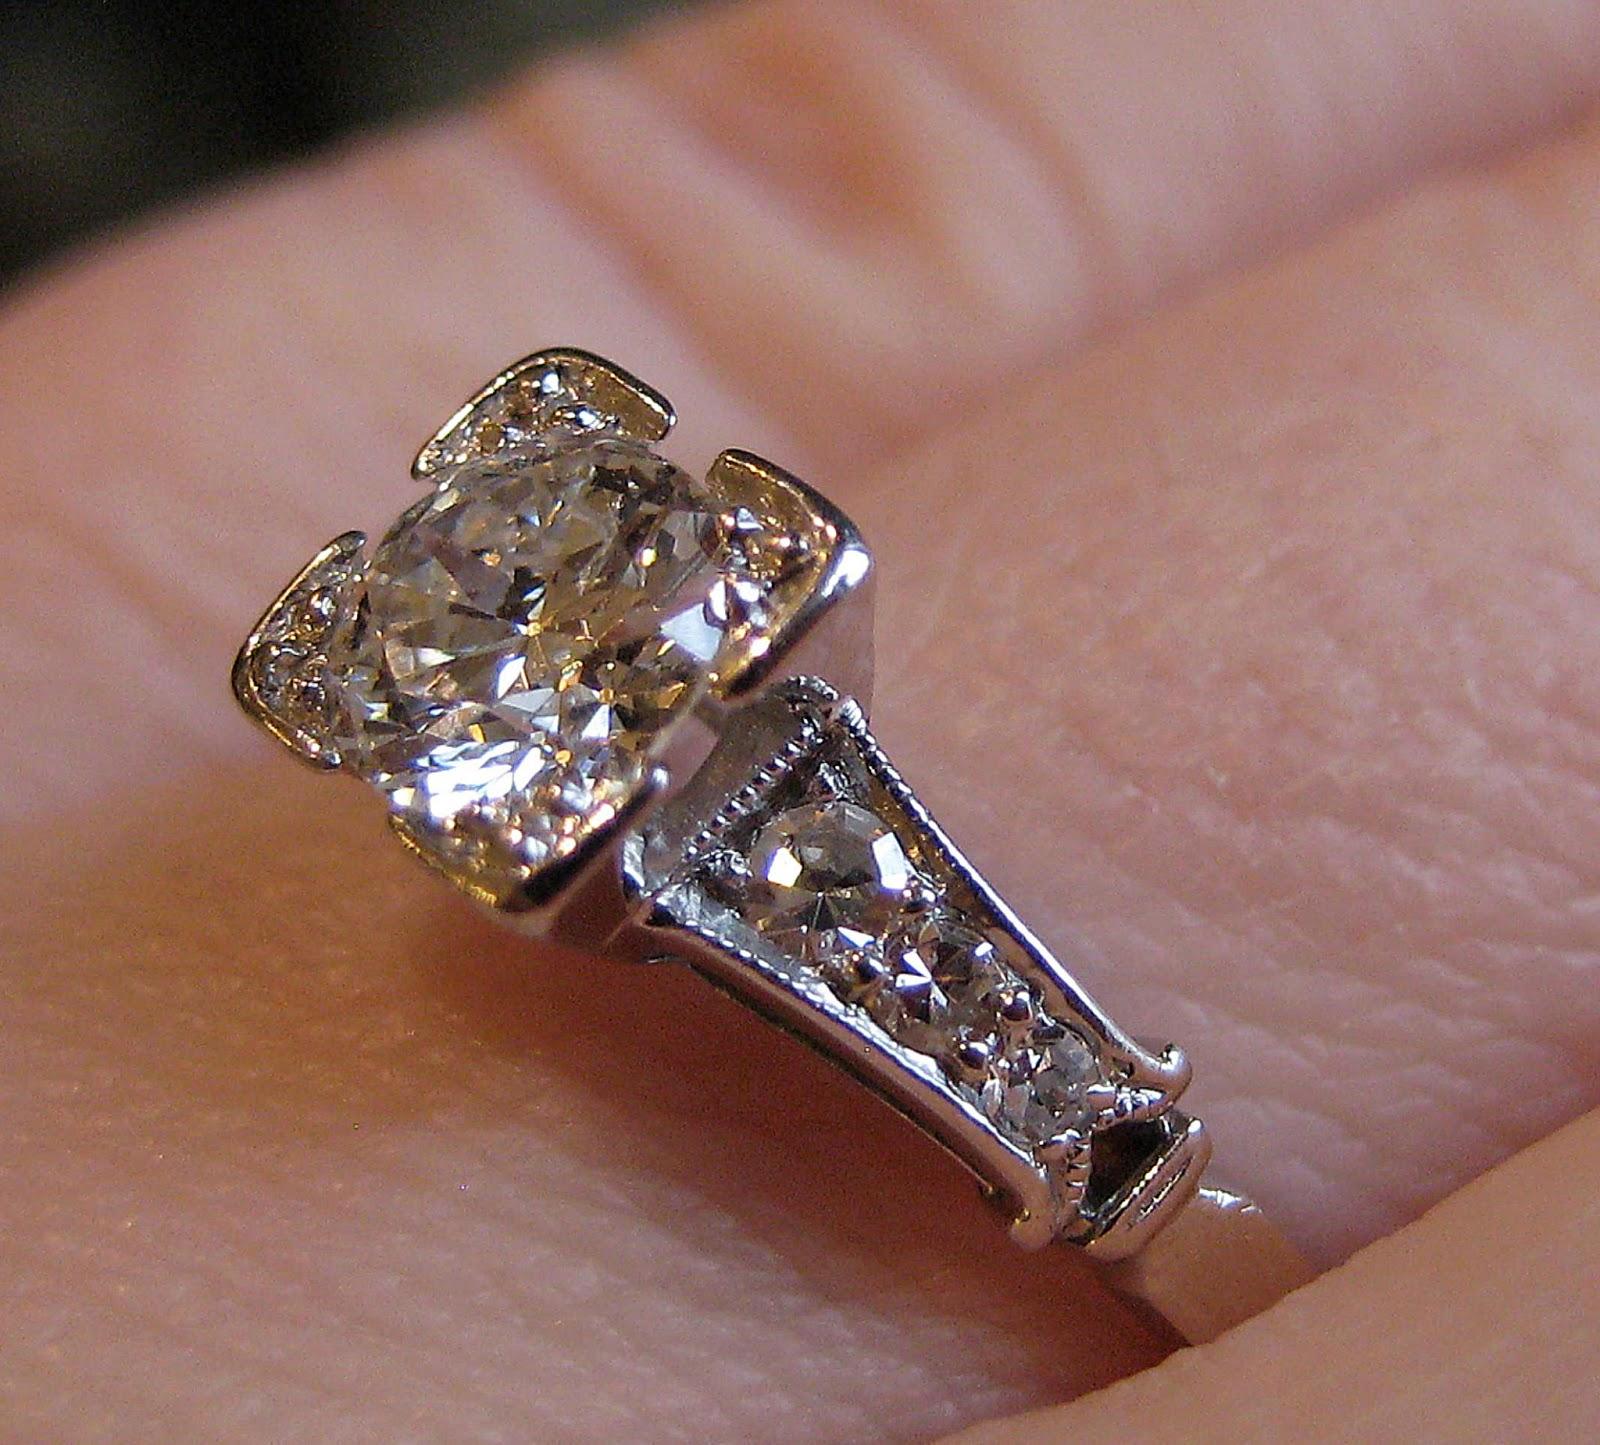 Sparkly Engagement Rings Tumblr Vintage Wedding Ring Tumblr